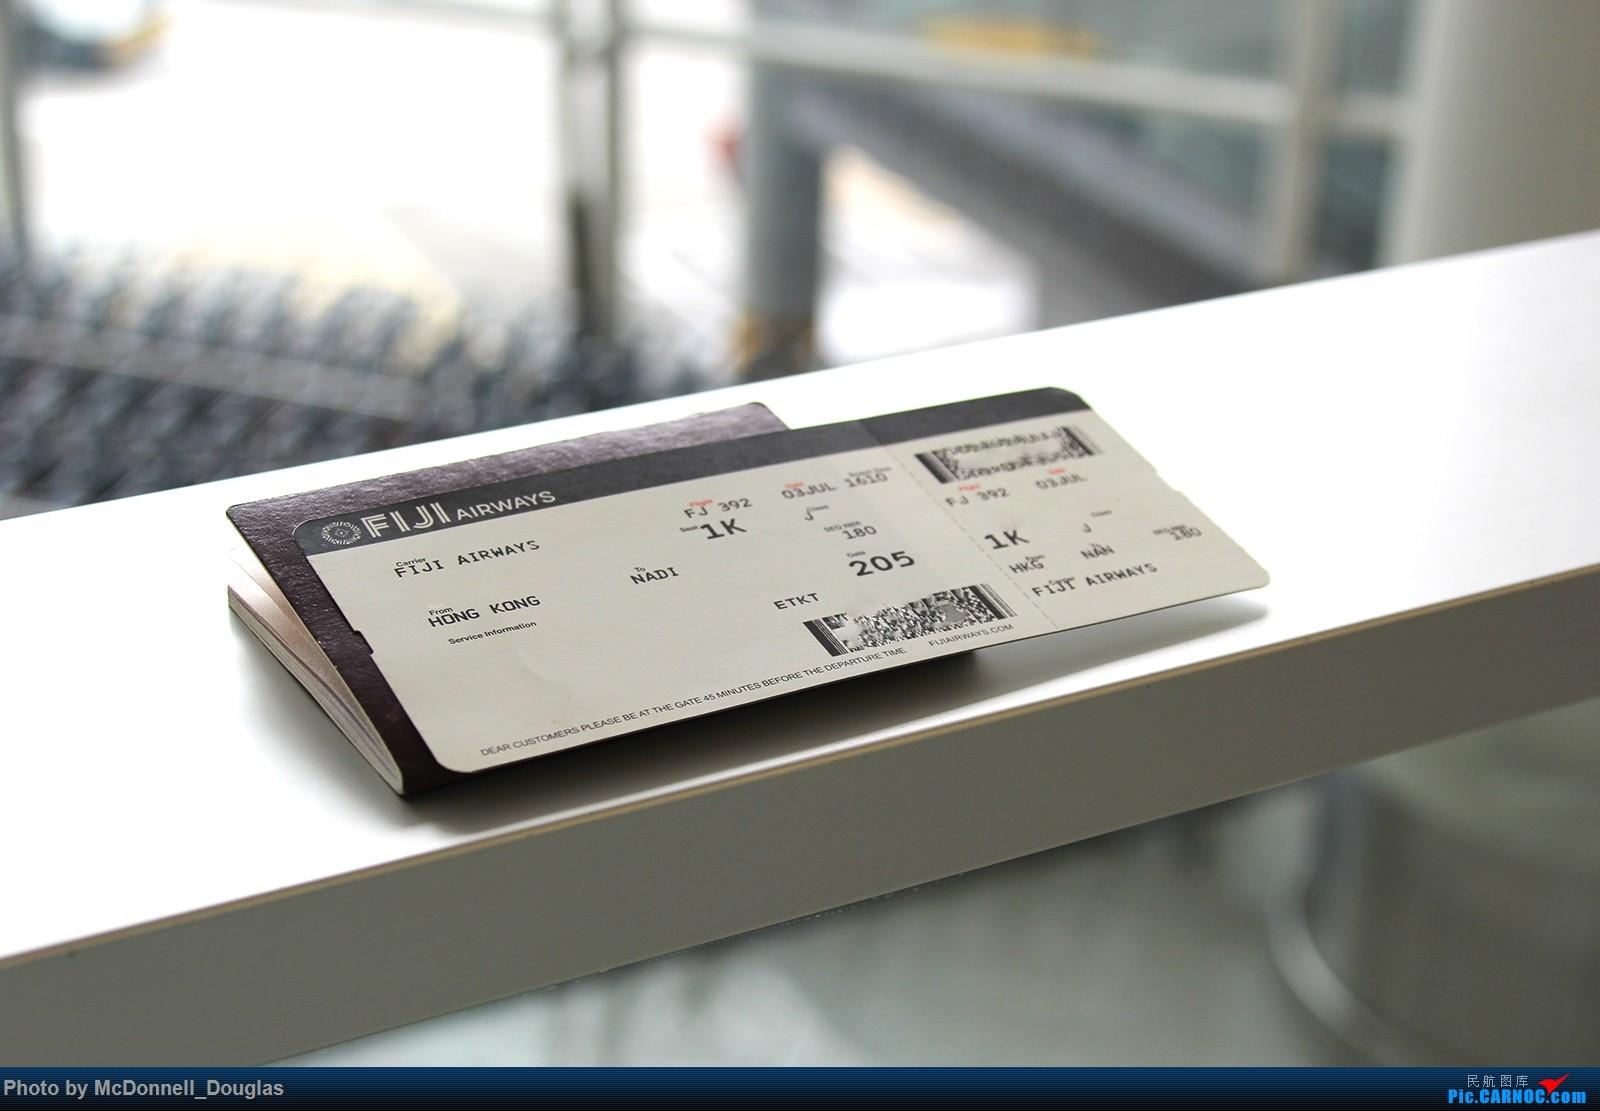 Re:[原创]【上海飞友会】【zc带你游天下(5)】起意只因一时冲动,飞过赤道去避暑,领略南太平洋别样的风光 YAKOVLEV YAK-40 RA-88188 Cherepovets Airport